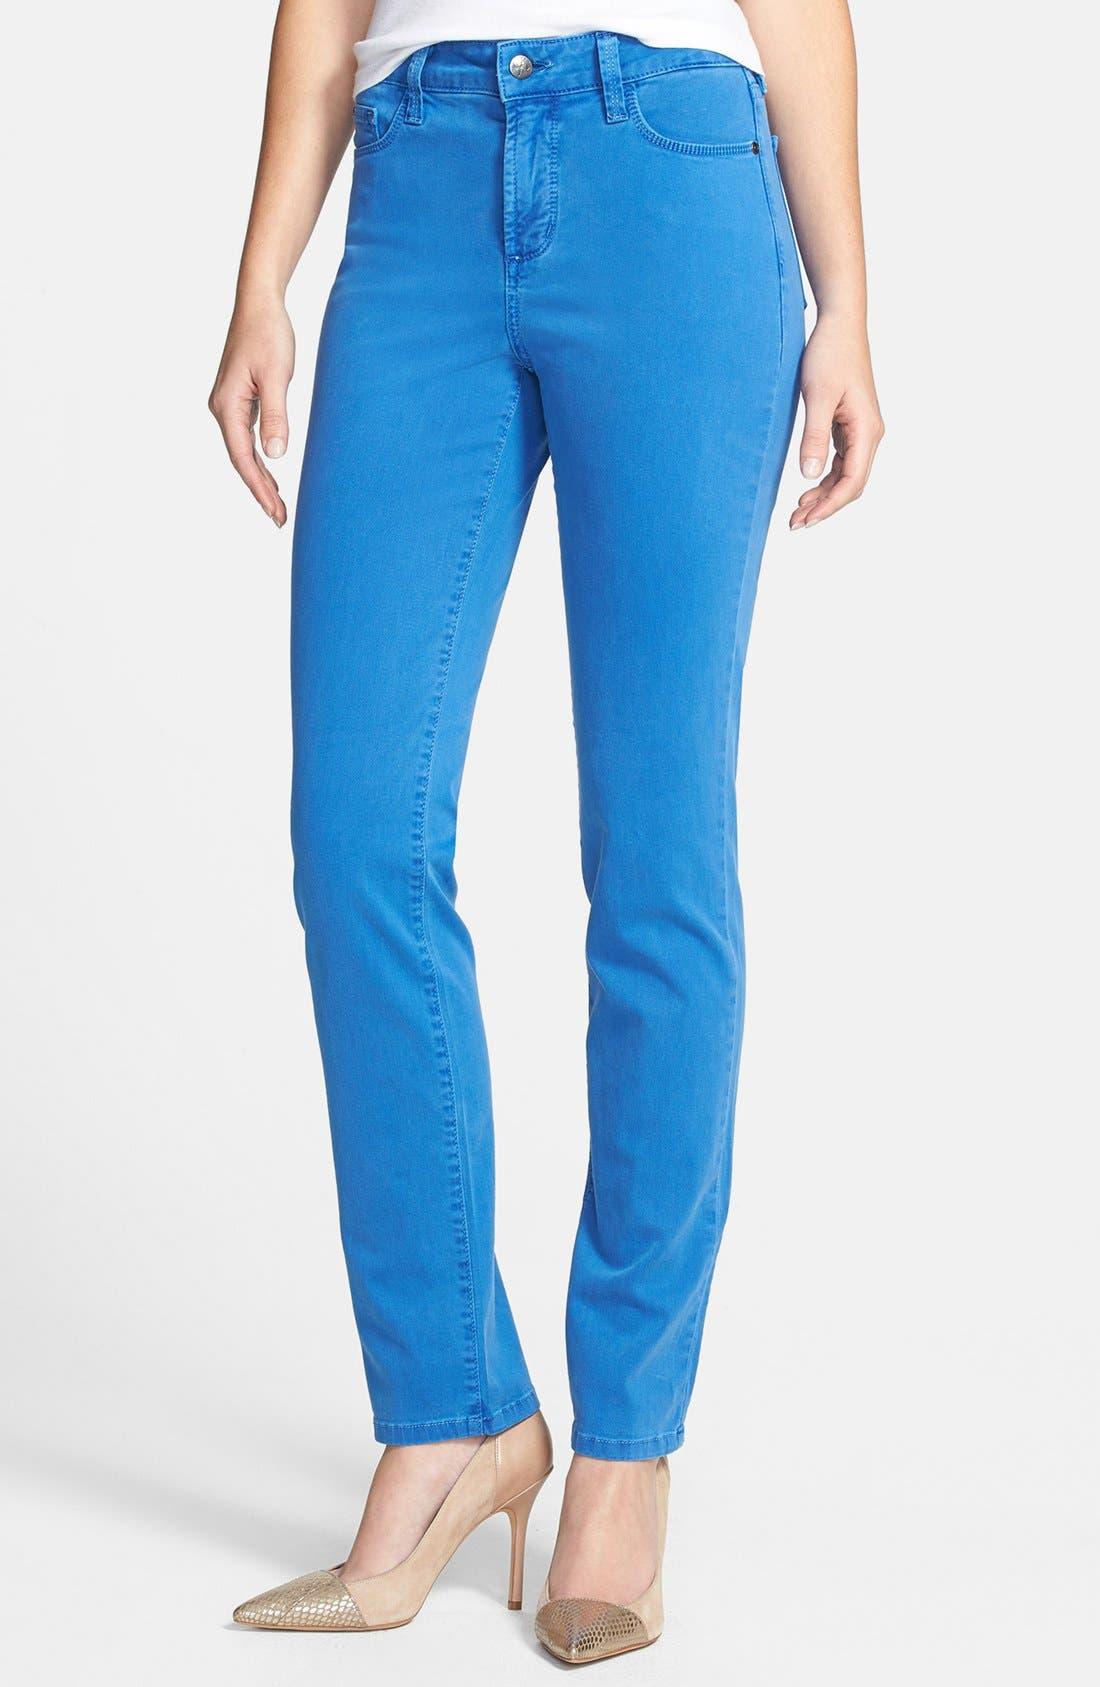 Alternate Image 1 Selected - NYDJ 'Sheri' Colored Stretch Denim Skinny Jeans